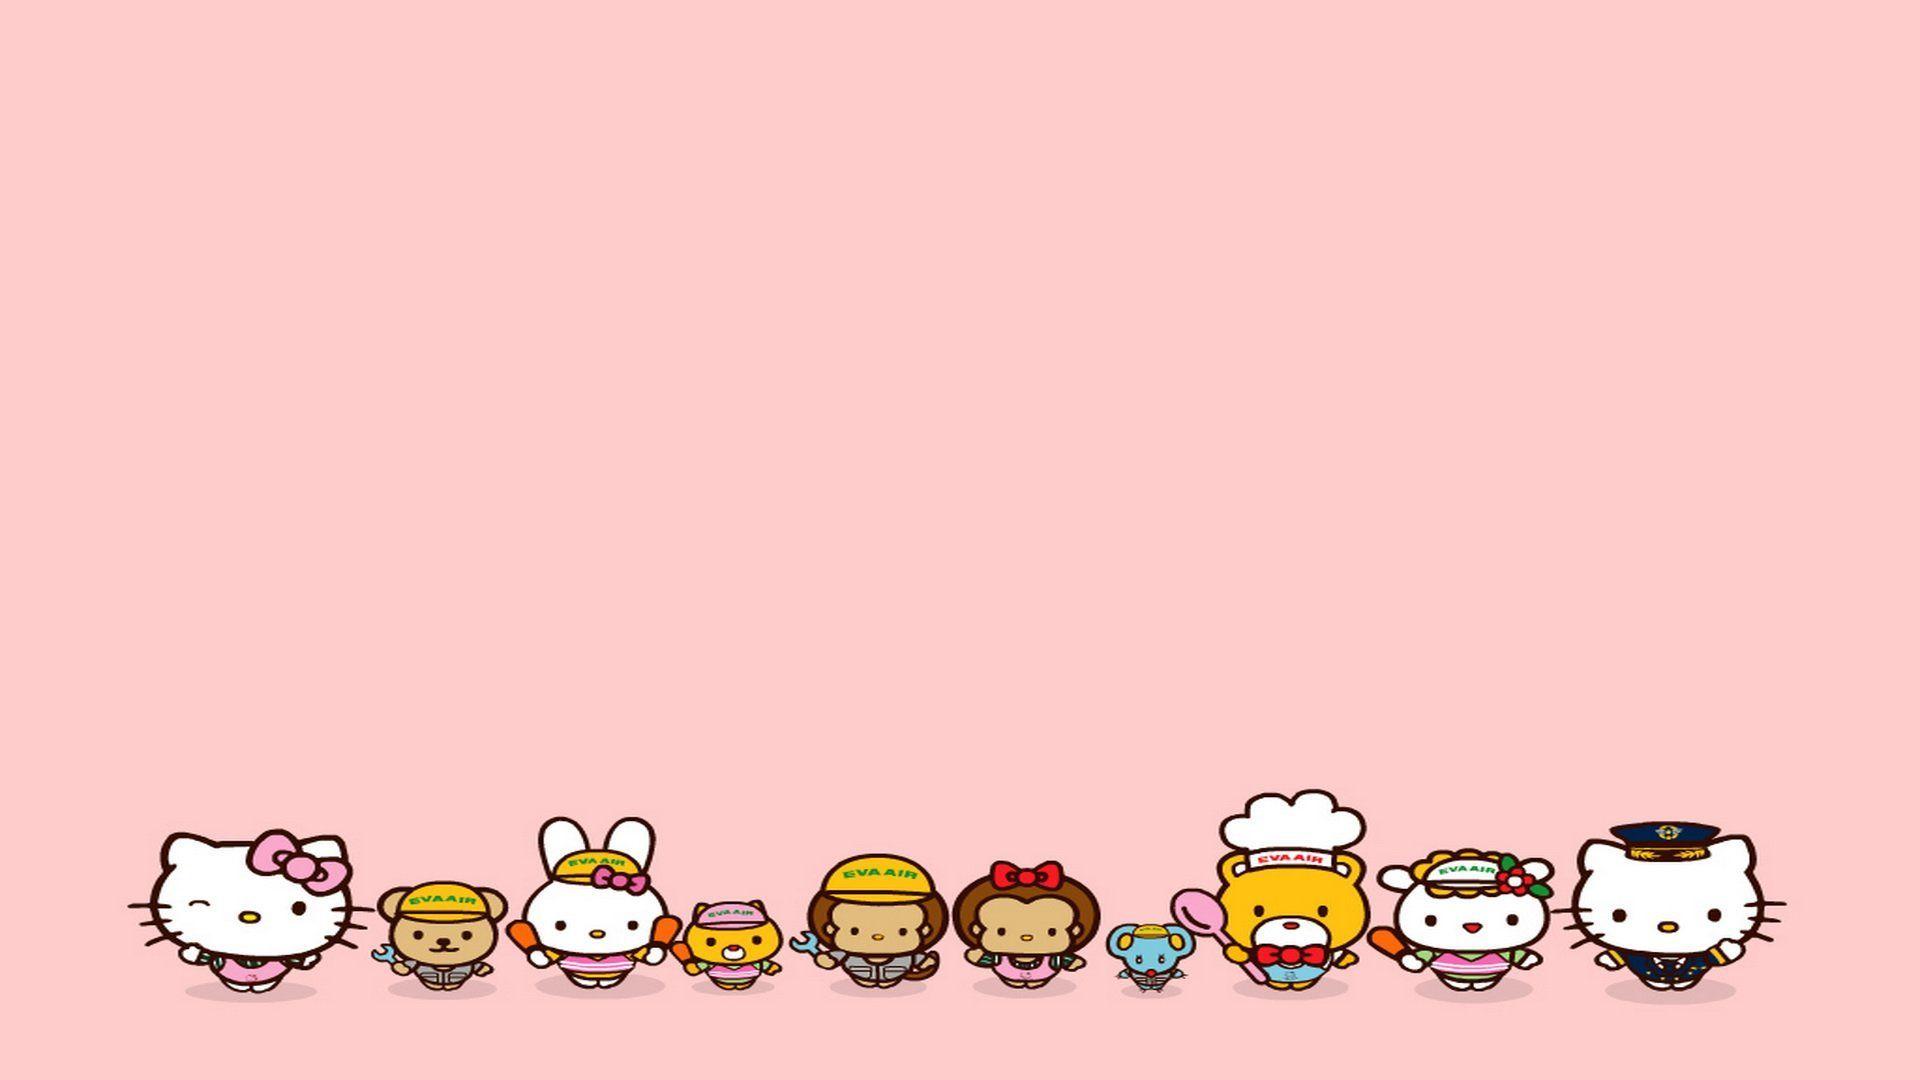 Hello Kitty Wallpaper Macbook Doraemon Hello Kitty Backgrounds Hello Kitty Wallpaper Hd Hello Kitty Wallpaper